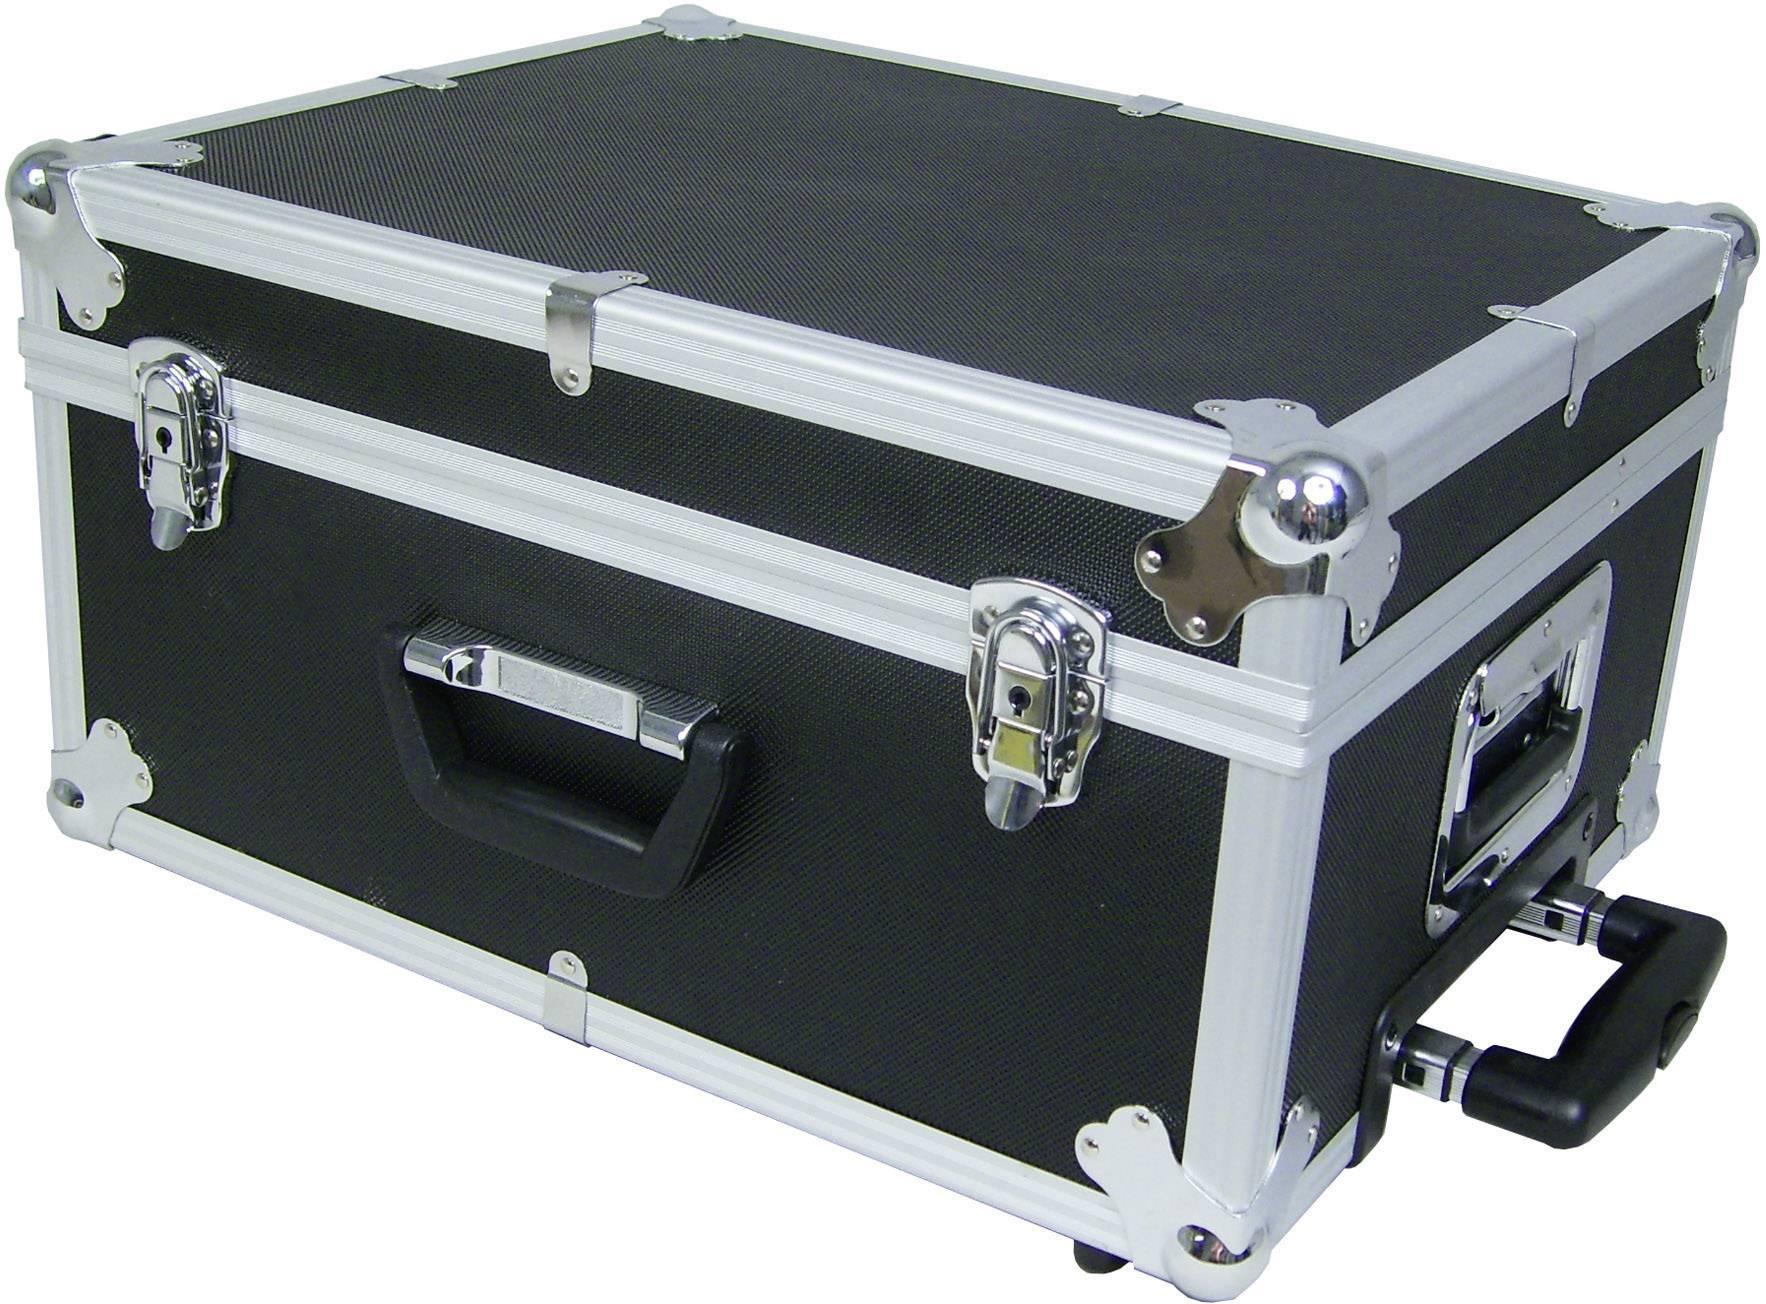 Kufřík na nářadí VISO MALLEWS, (d x š x v) 450 x 350 x 210 mm